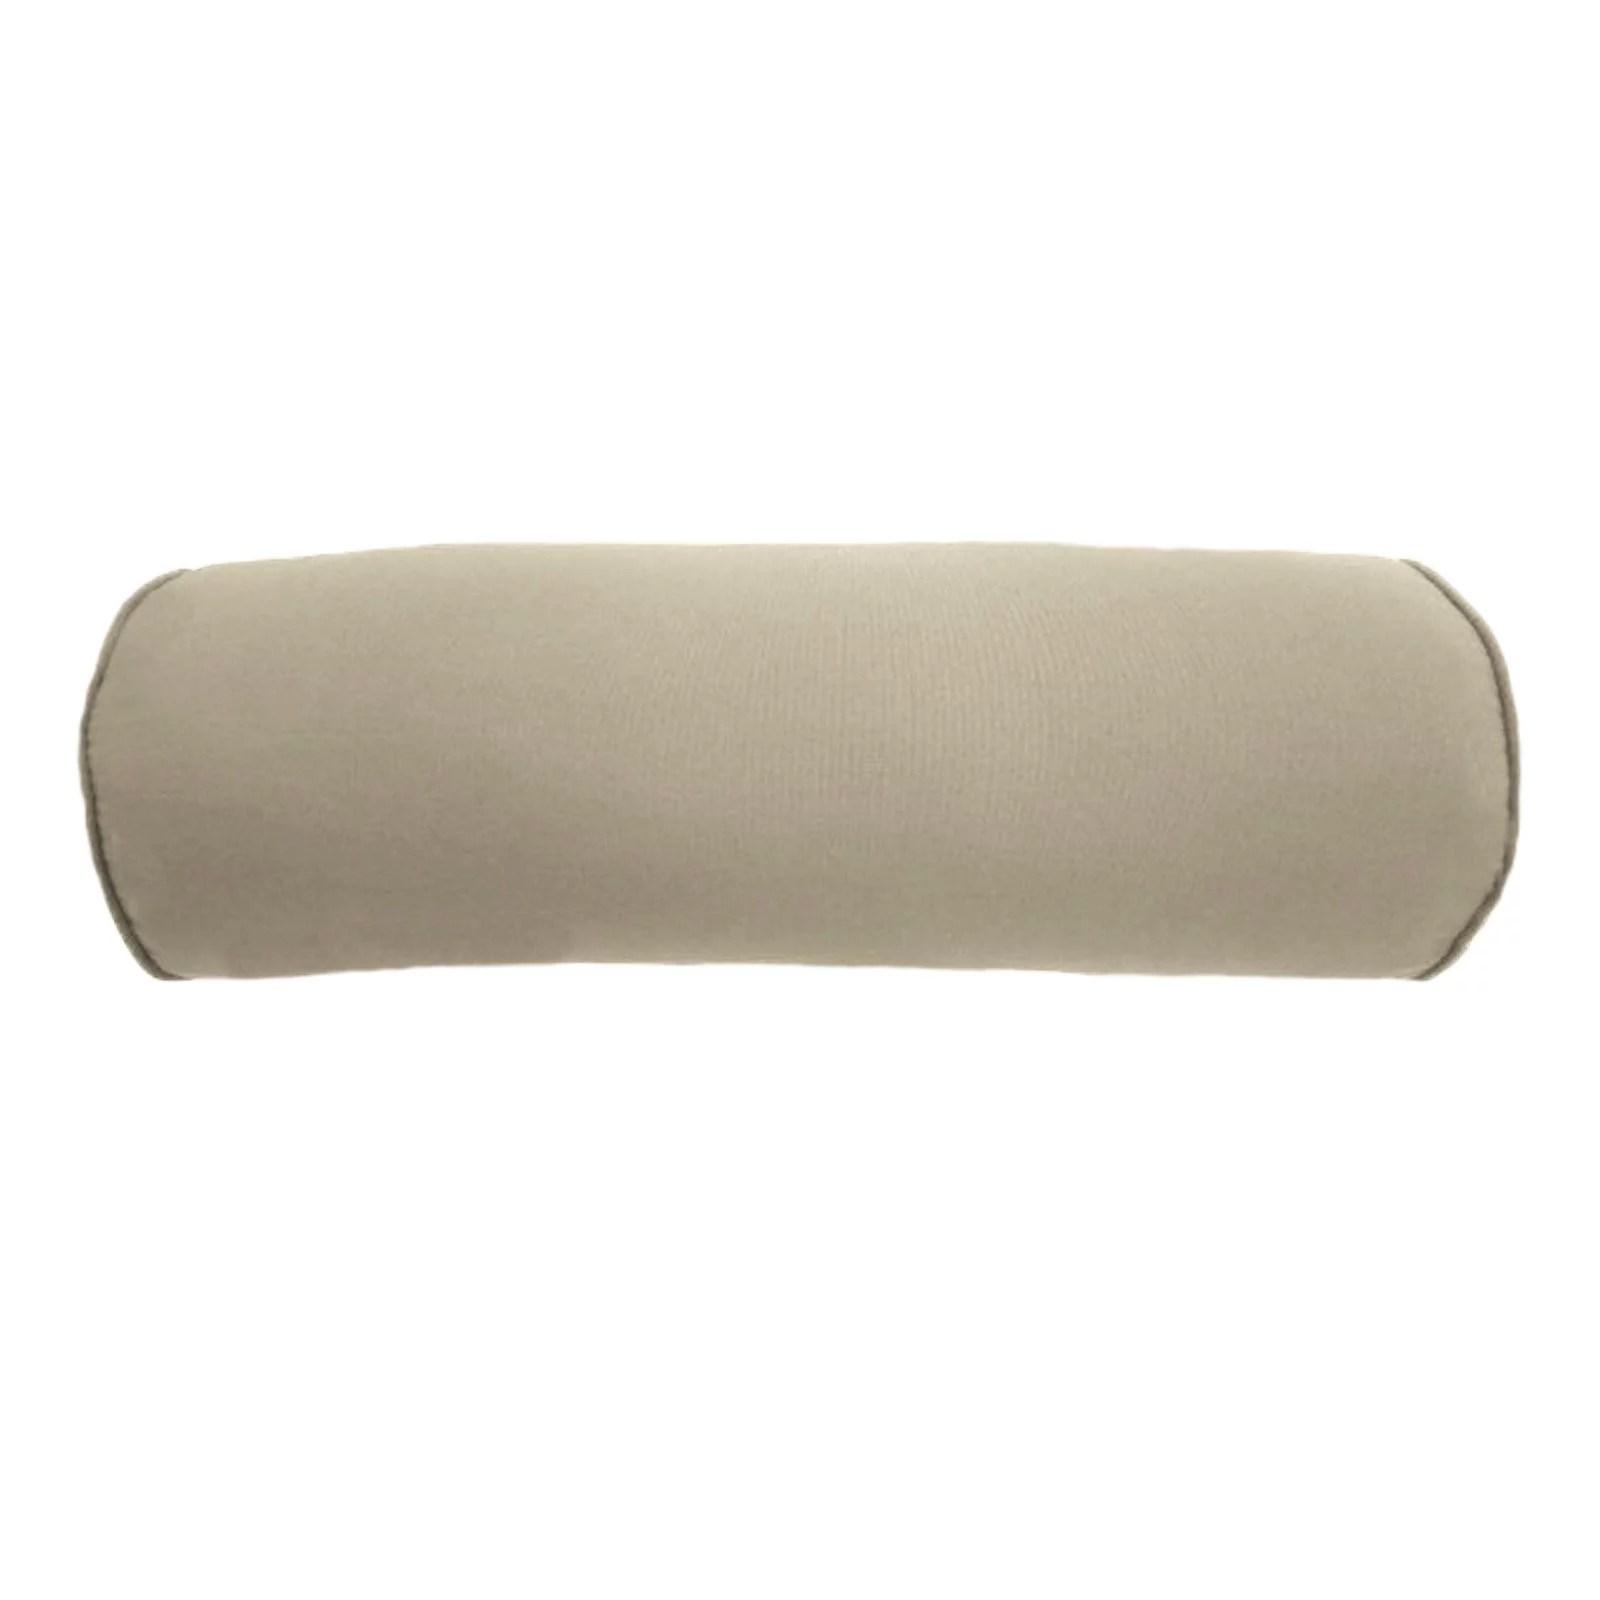 easy way 20 x 7 in solid sunbrella outdoor bolster pillow